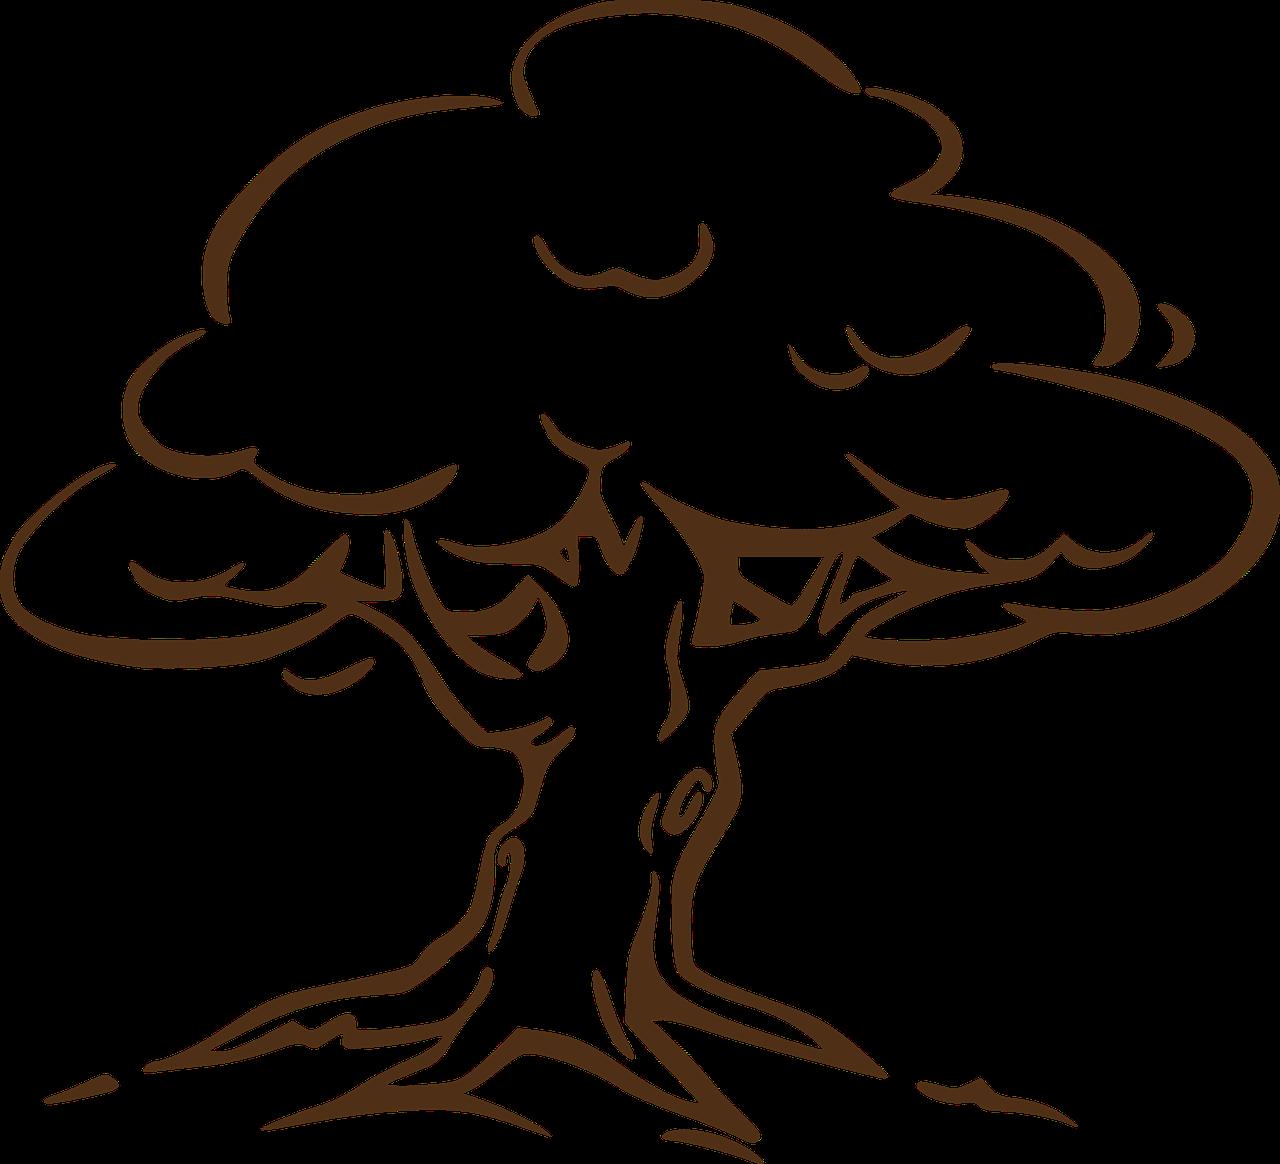 Tree,oak,wind,leaves,roots - free image from needpix.com